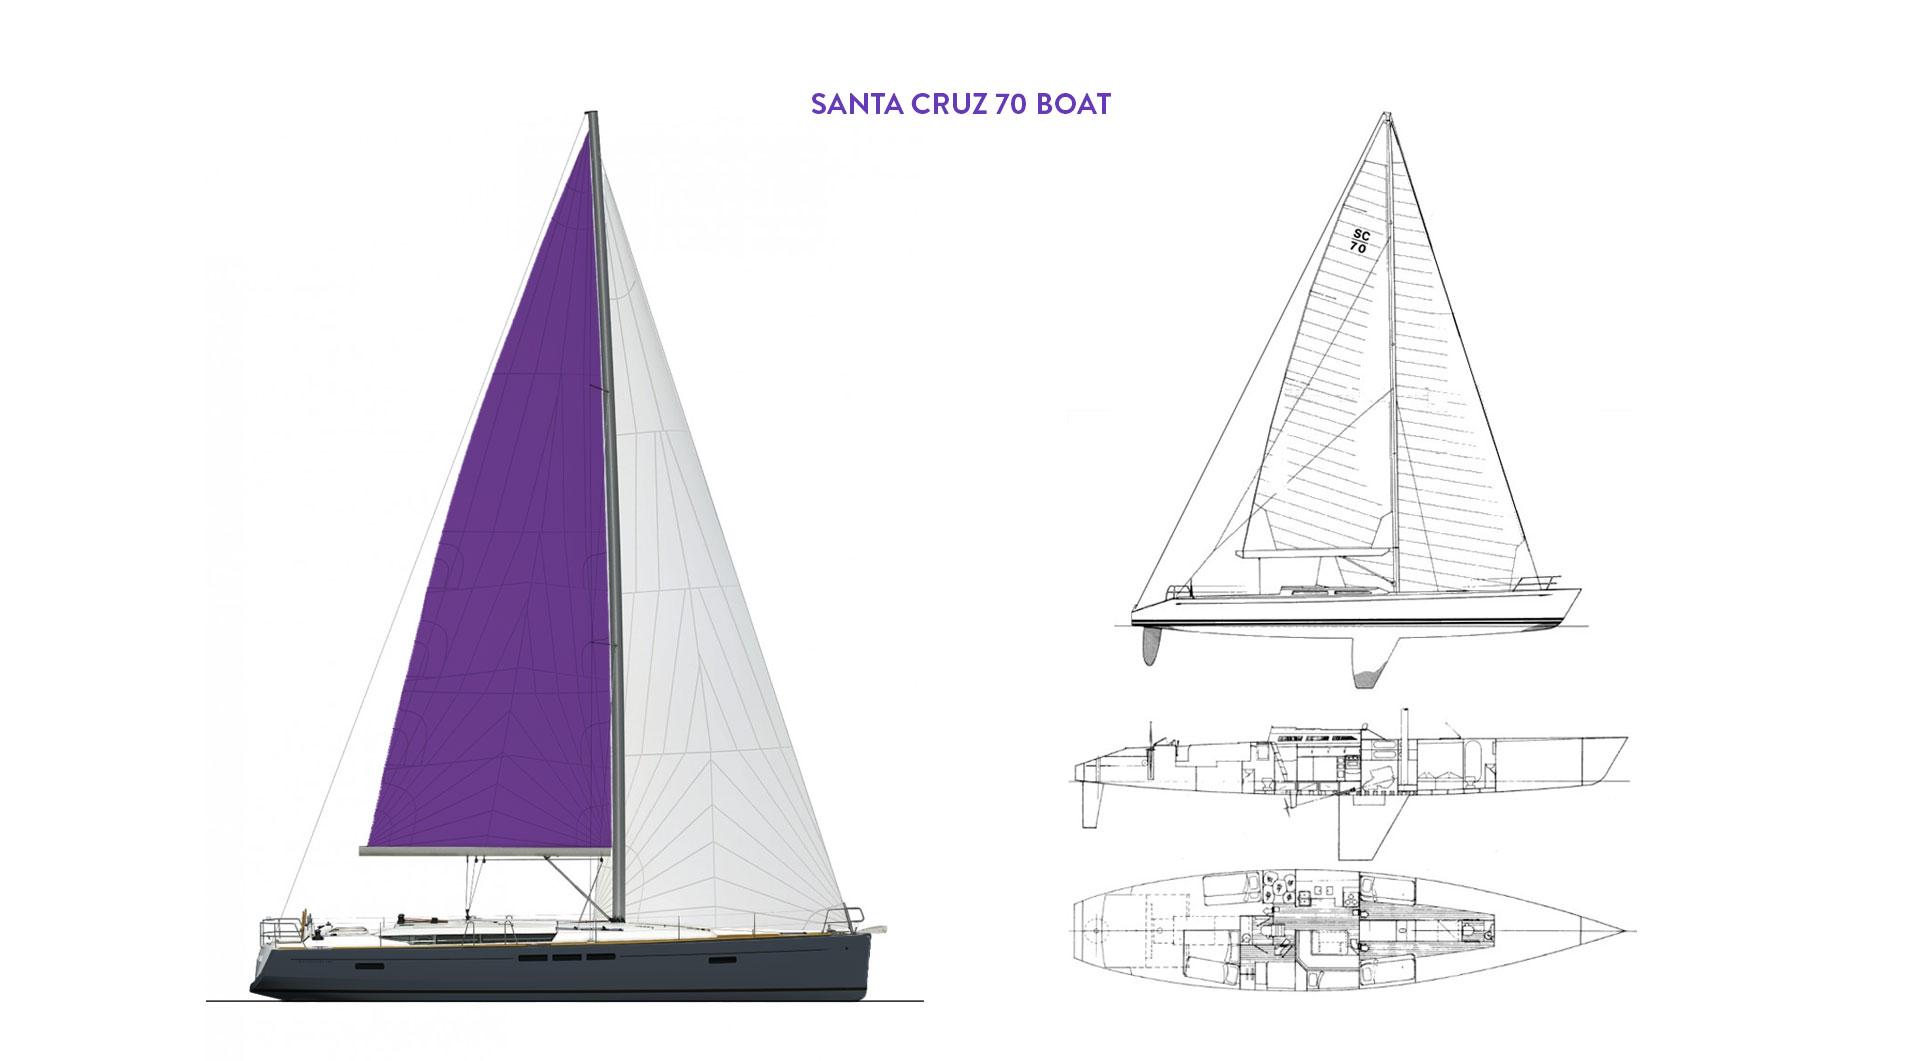 Boat_drawing-2.jpg